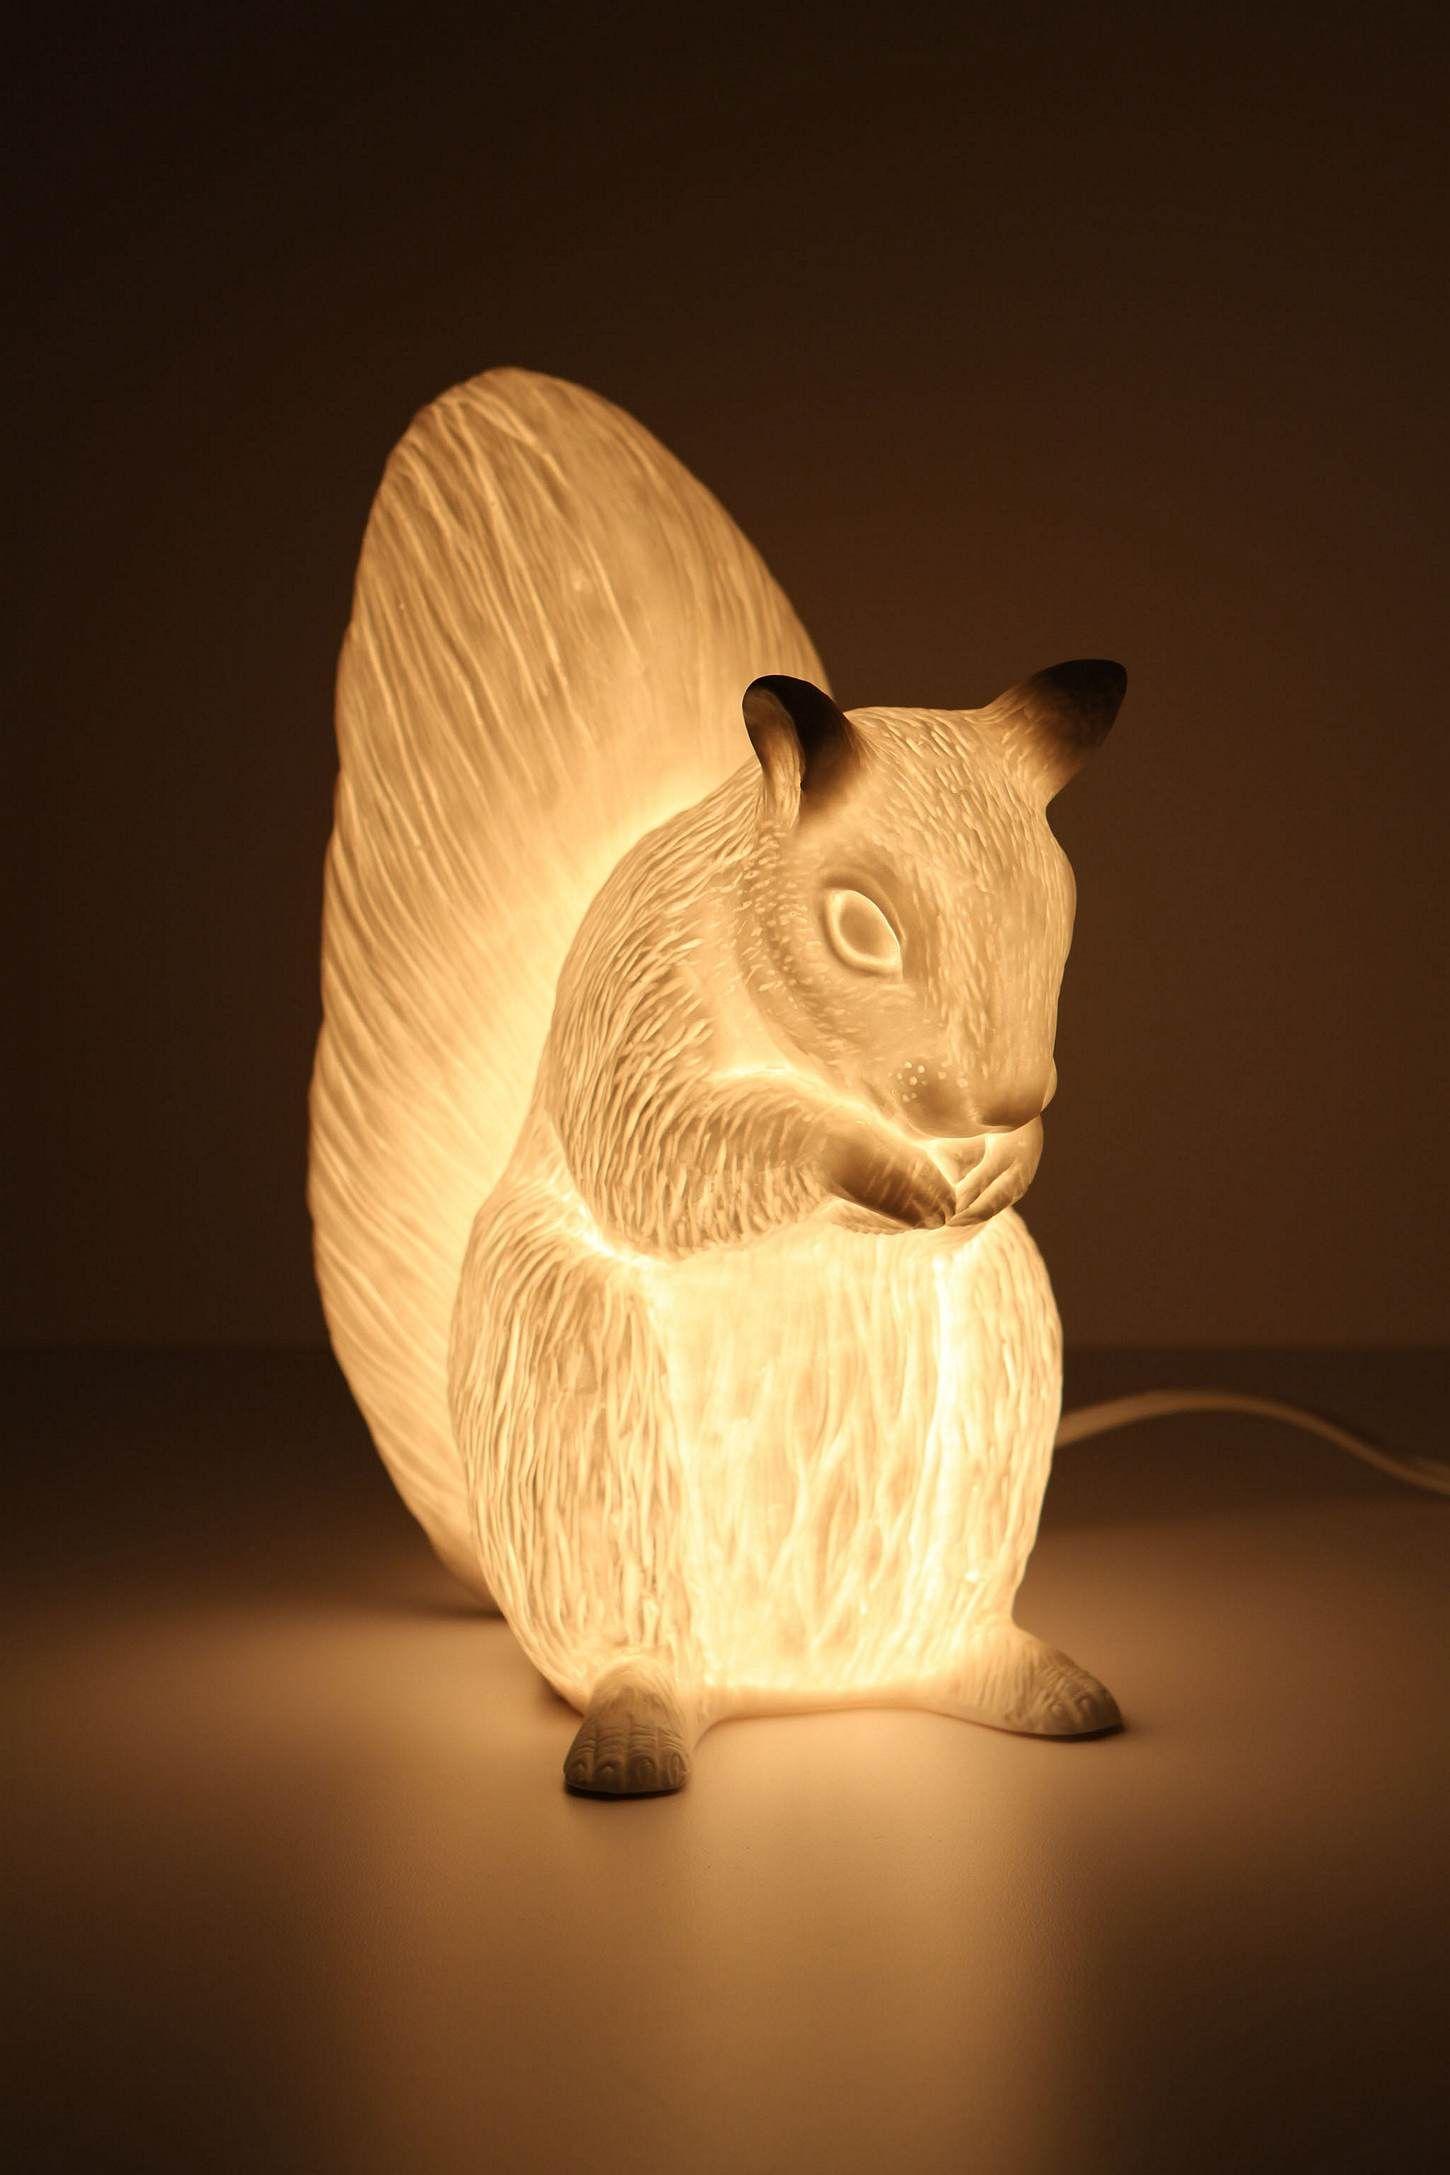 Delightful Squirrel Night Light